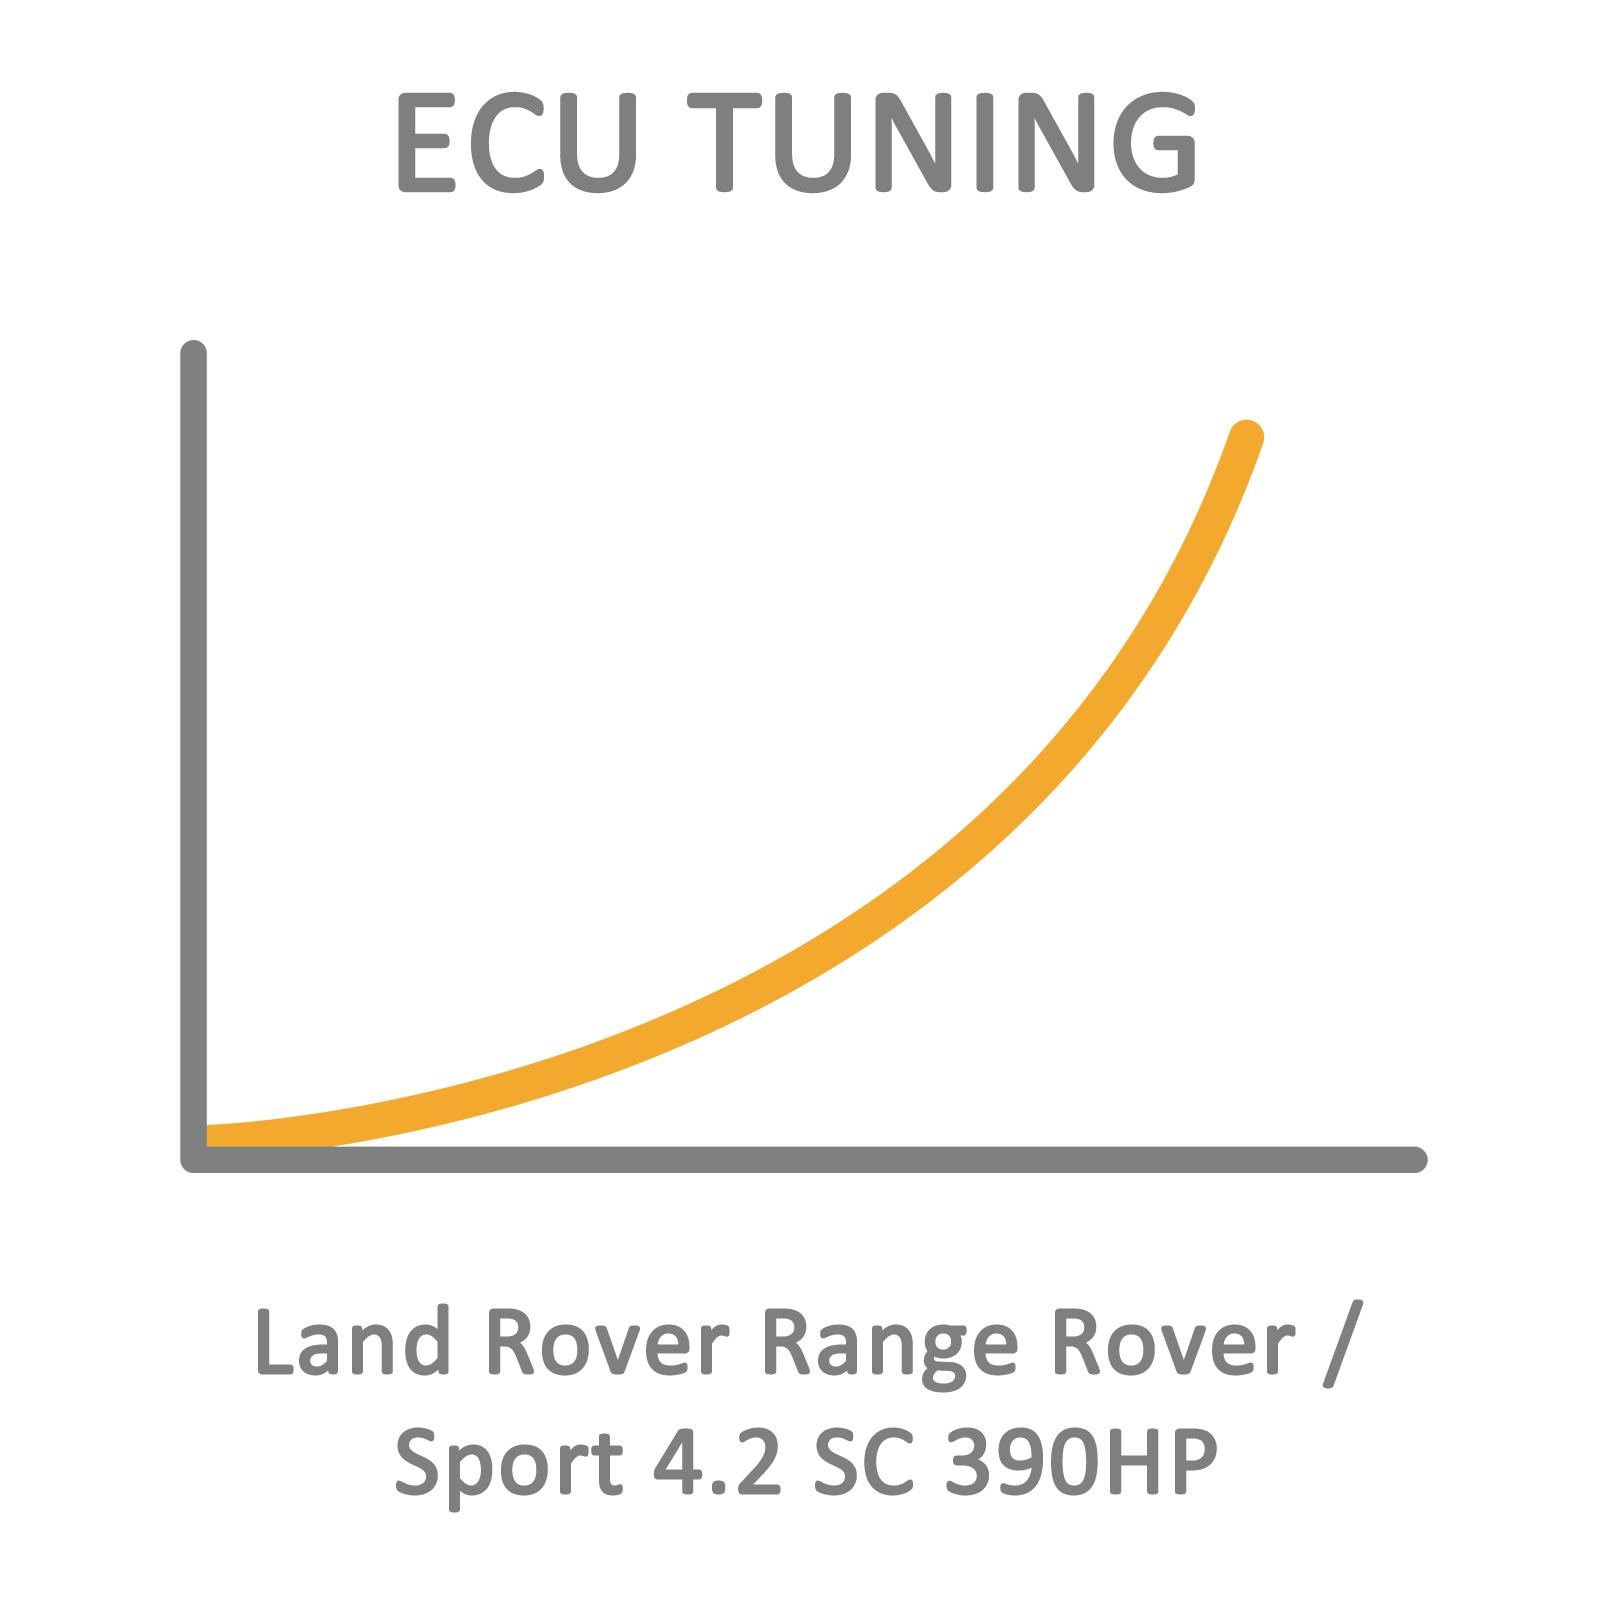 Land Rover Range Rover / Sport 4.2 SC 390HP ECU Tuning